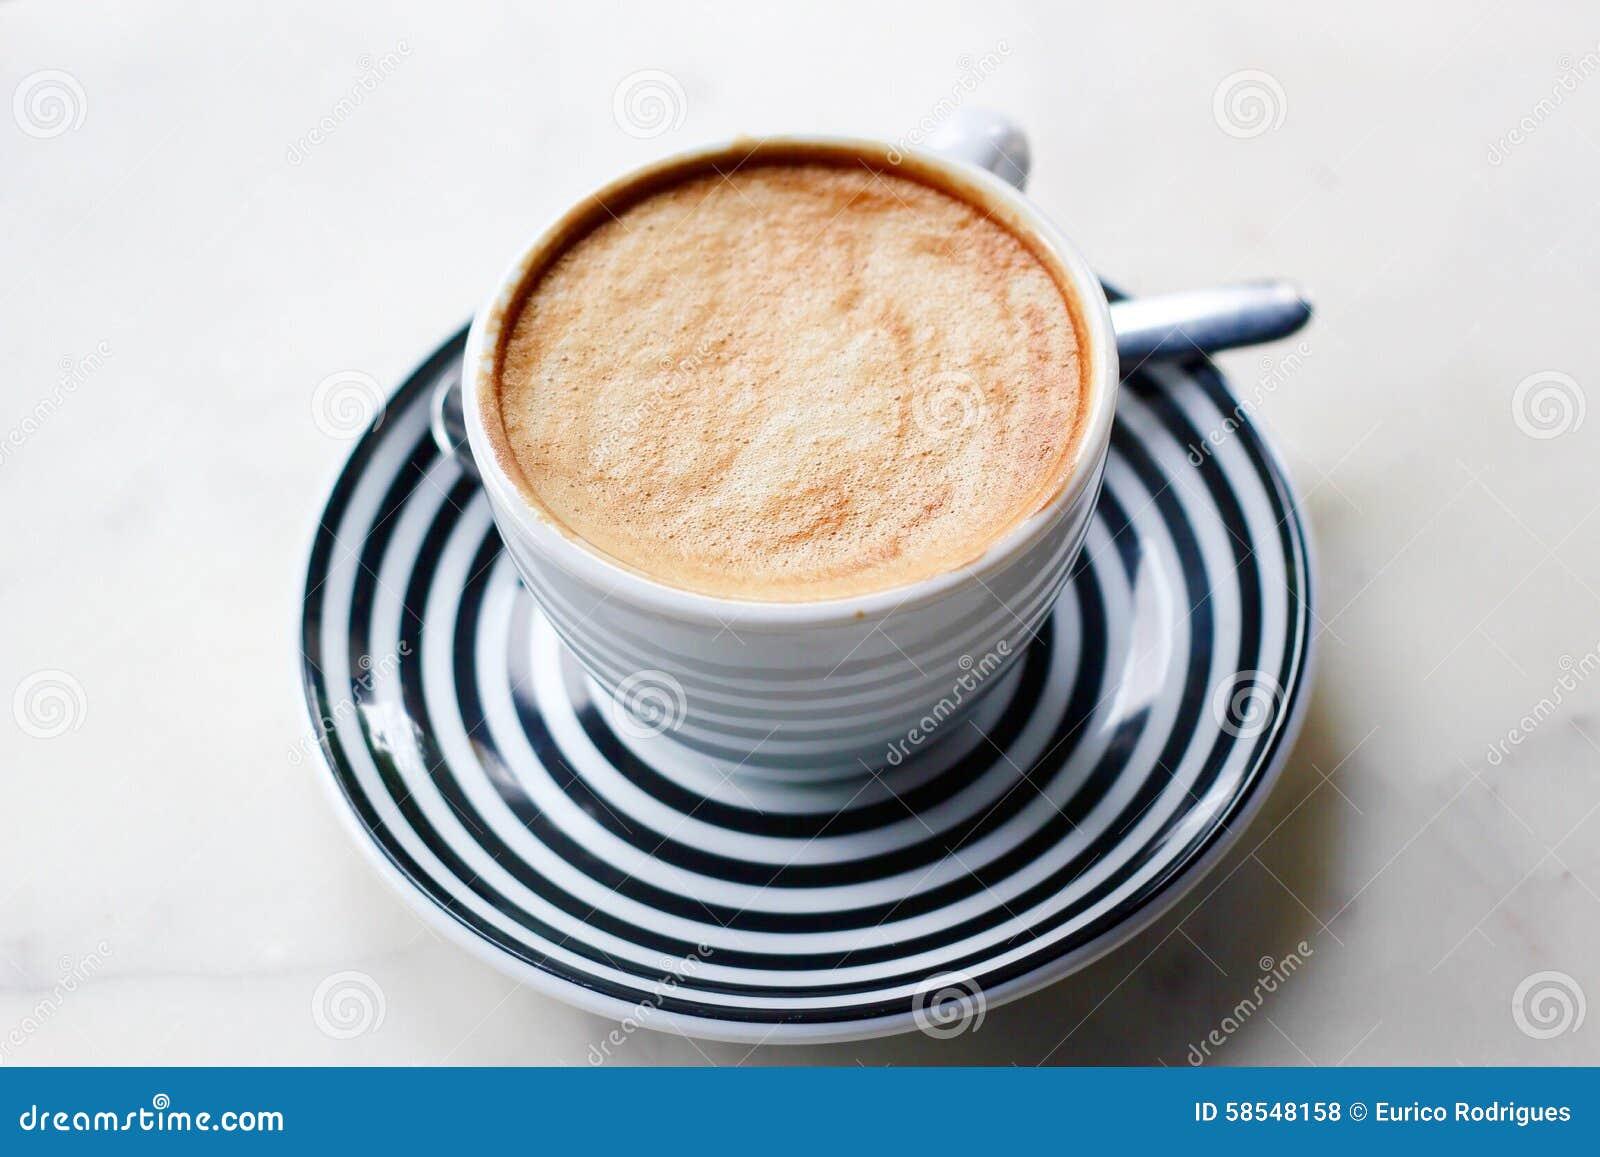 English In Italian: Type Of Coffee Preparation Stock Photo